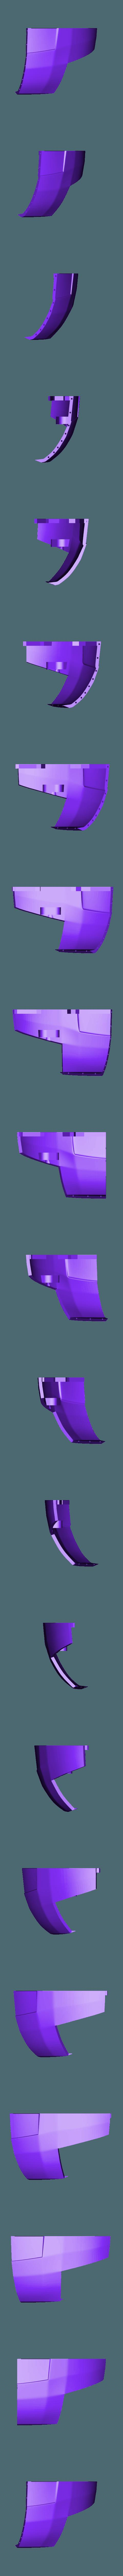 Top right 2.stl Download STL file Iron Man Mark 42  • 3D printing object, SKUPERDIY